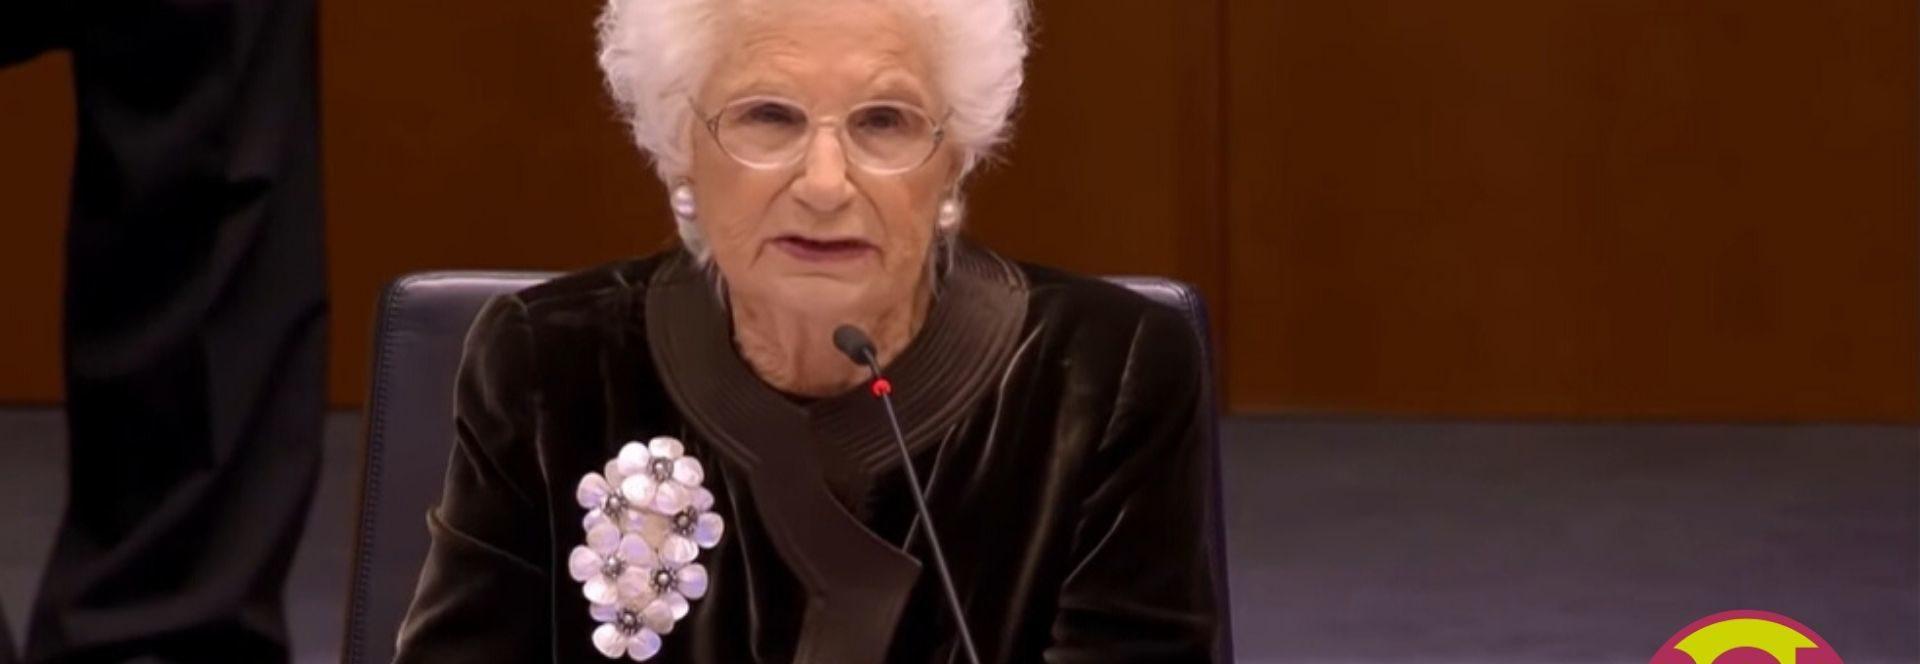 liliana segre discorso europarlamento